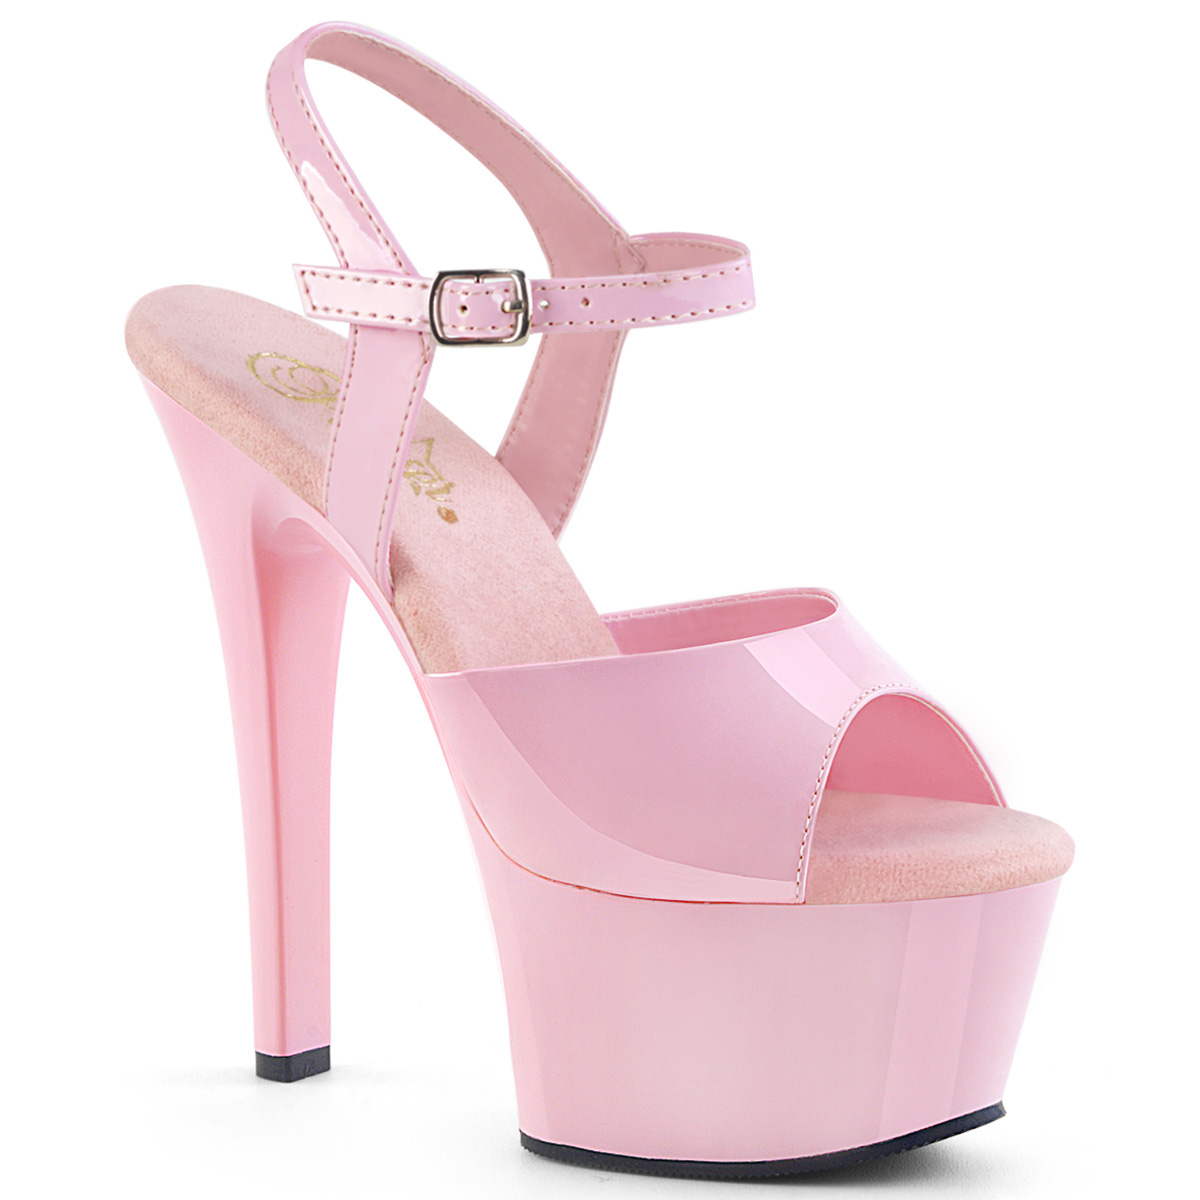 Platform High Heels ASPIRE-609 - Patent